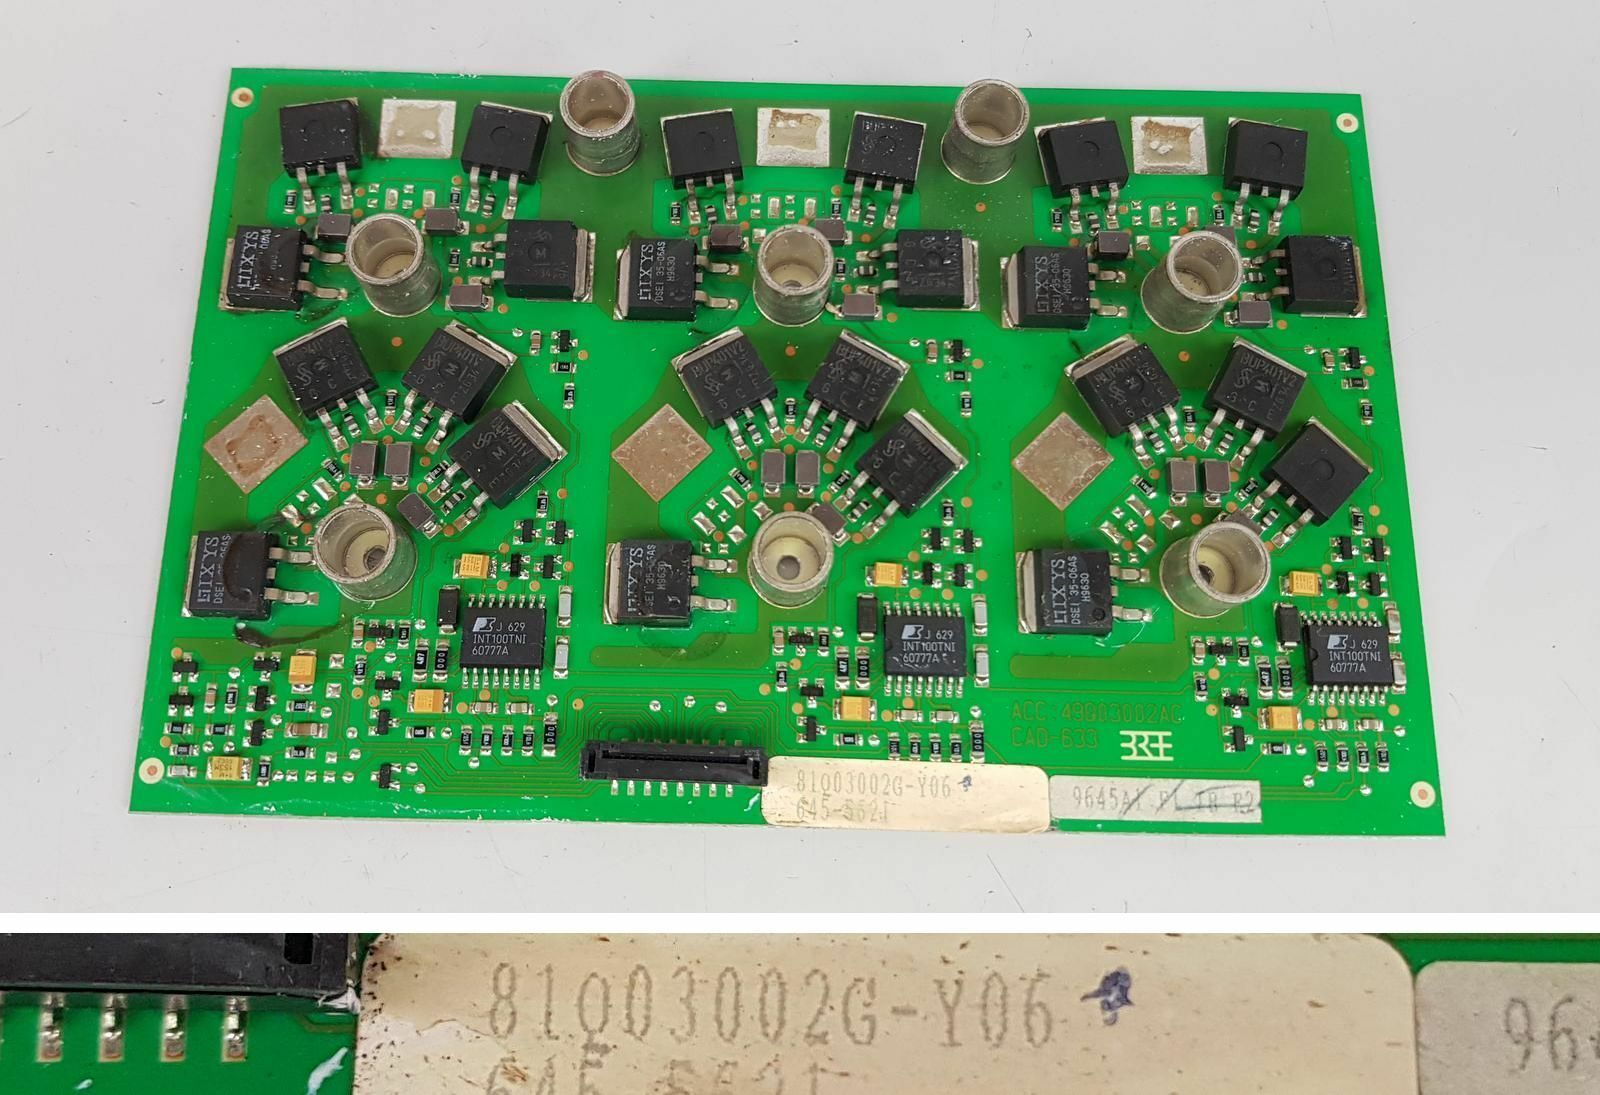 PP5964 Servoregler board ABB KRAFT-G 81Q03002G Y06